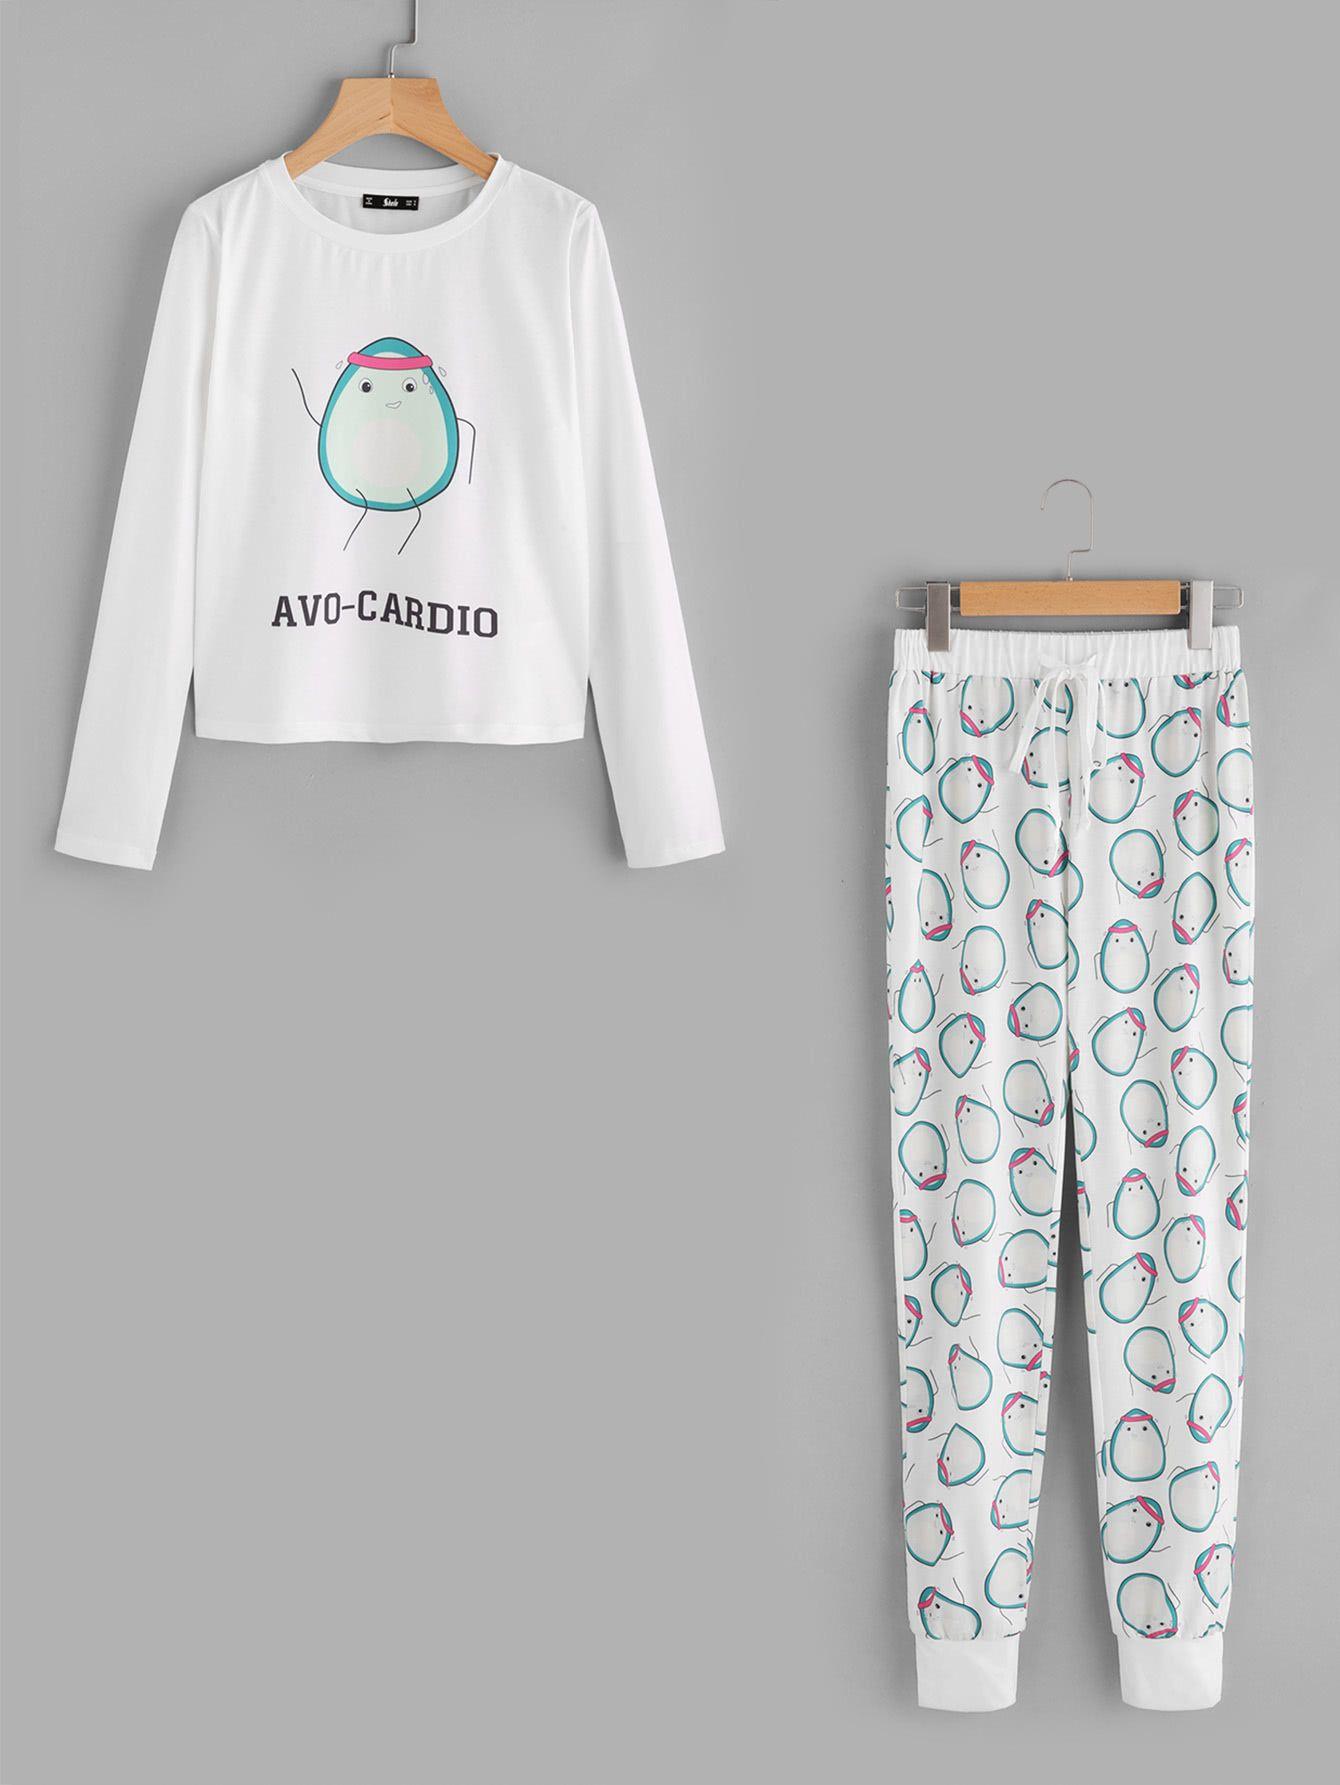 9b2bcdfe43 Shop Avocado Print Tee And Drawstring Sweatpants Pajama Set online. SheIn  offers Avocado Print Tee